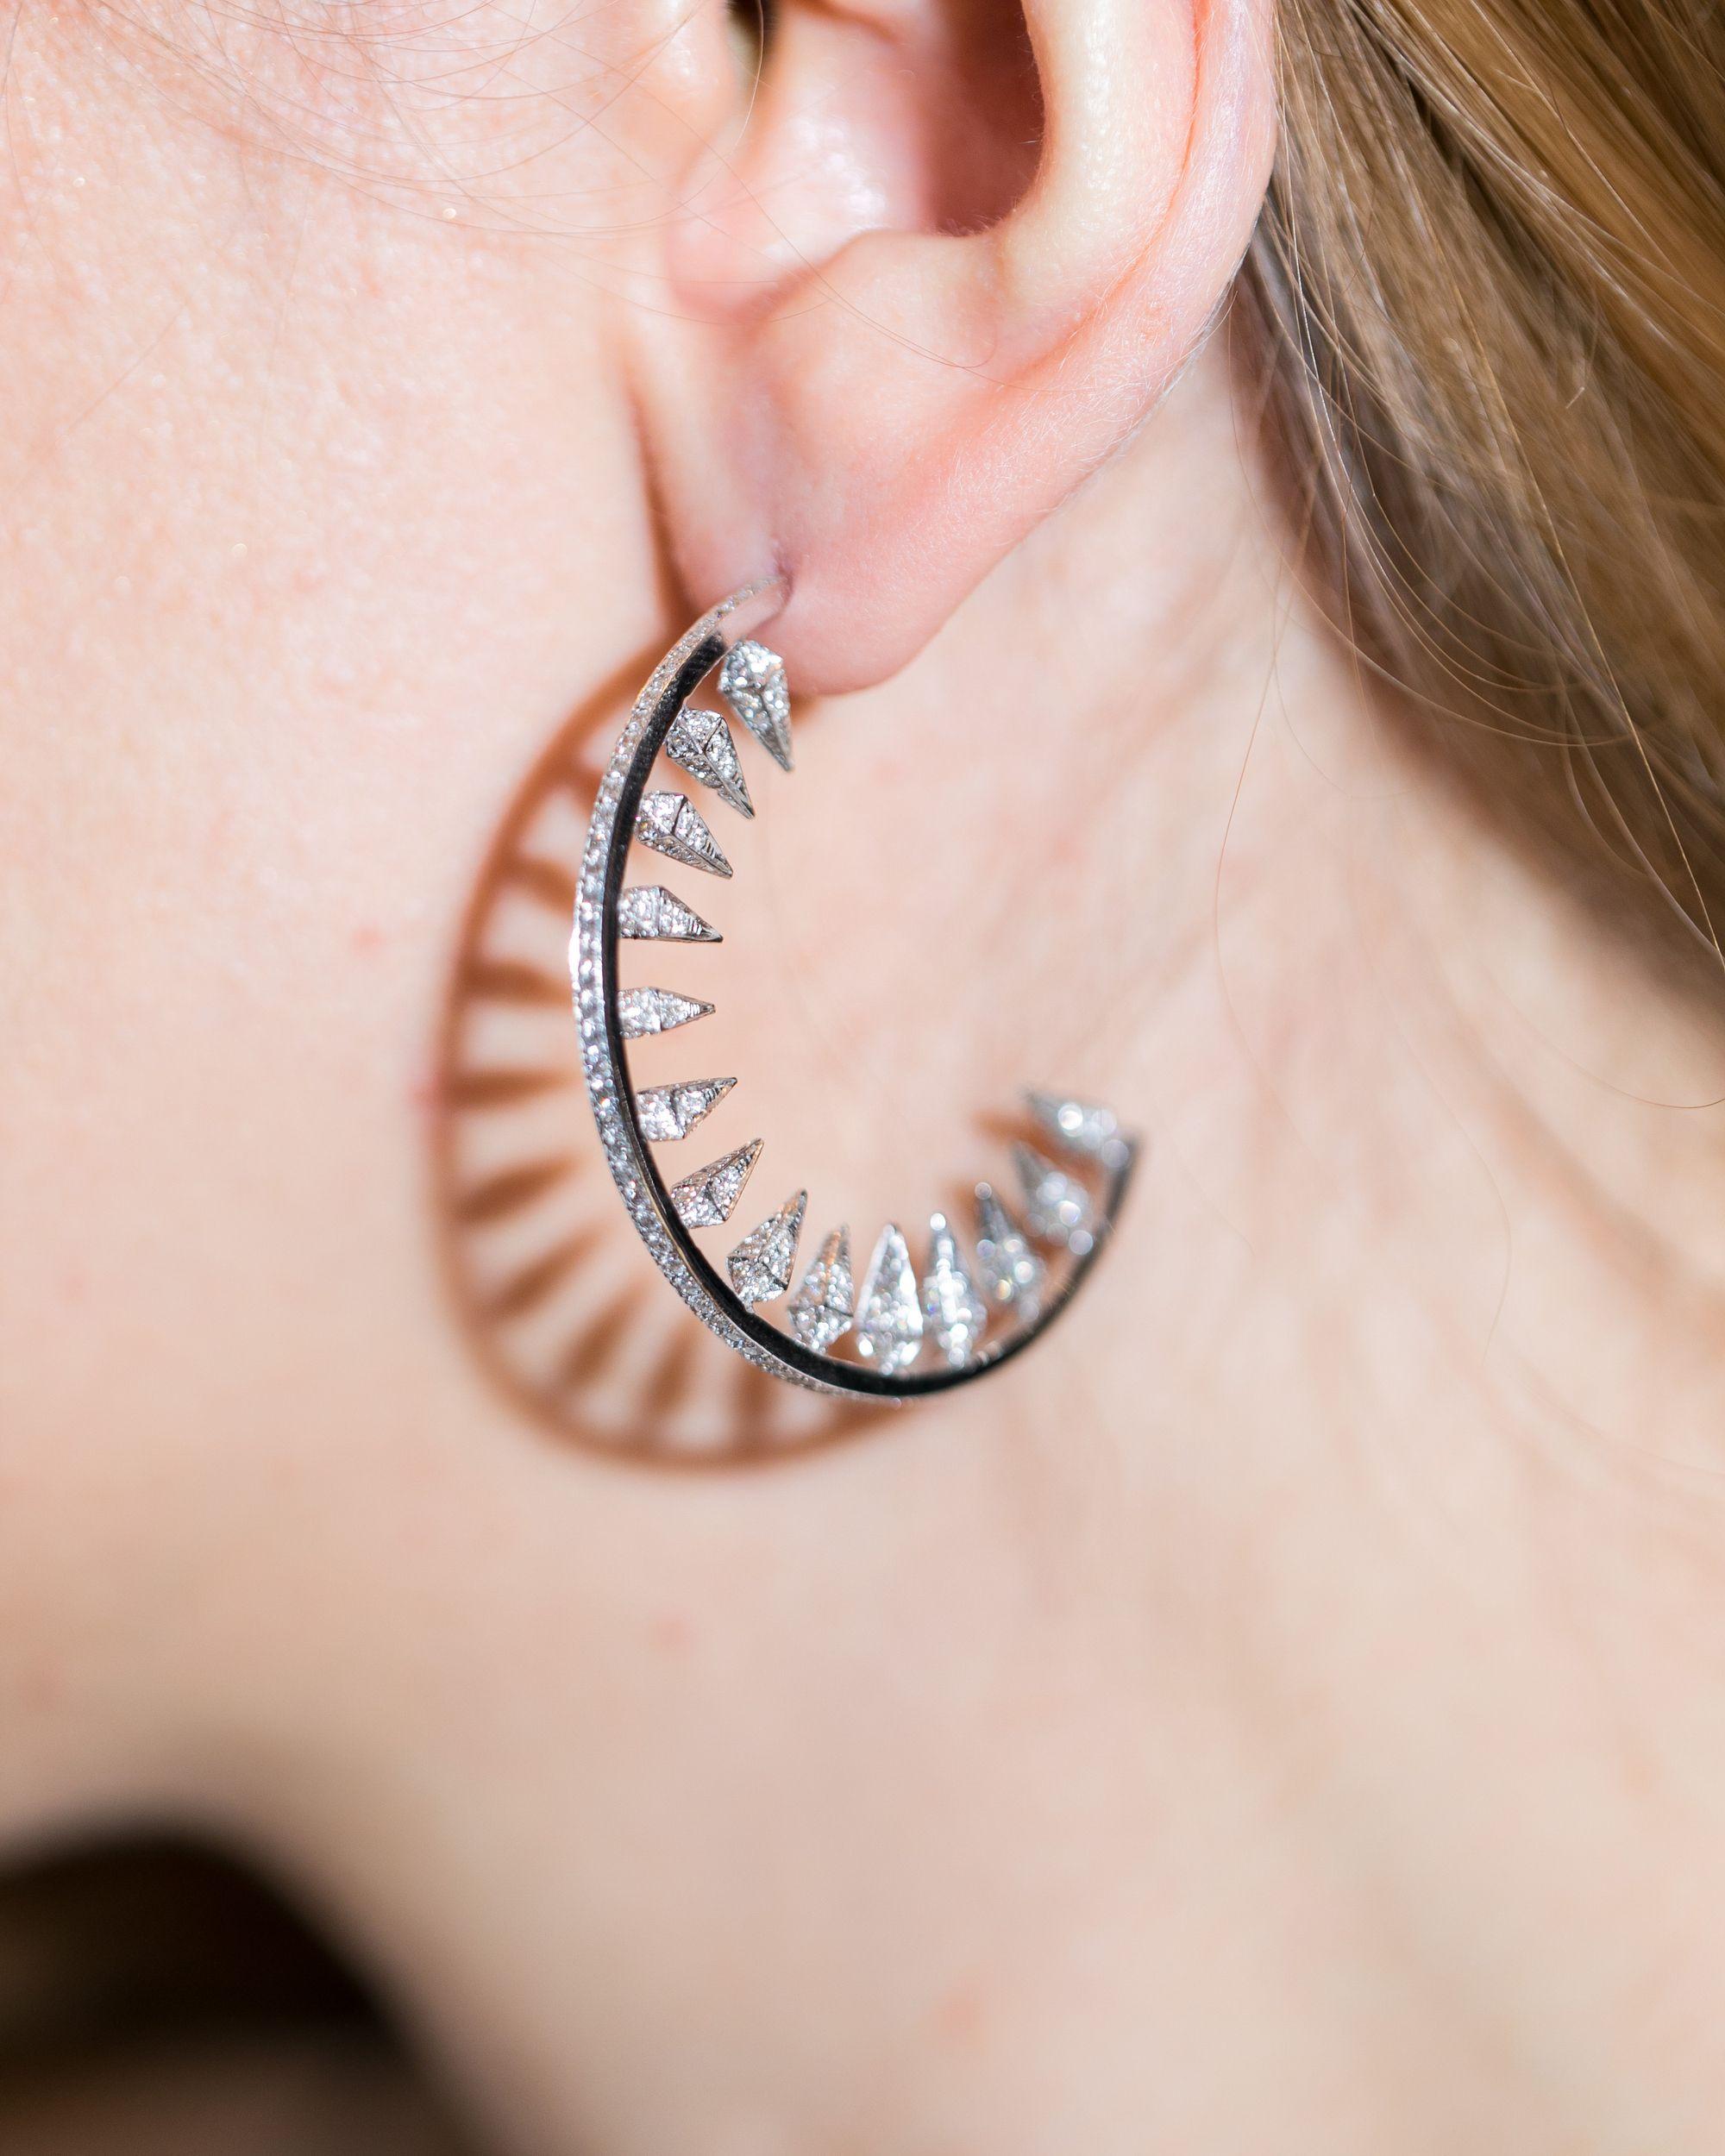 Unique Diamond Hoop Earrings Aesthetic On Ear By Karma El Khalil Jewelry See More Beautiful Diamond Indian Jewellery Design Earrings Classic Earrings Earrings